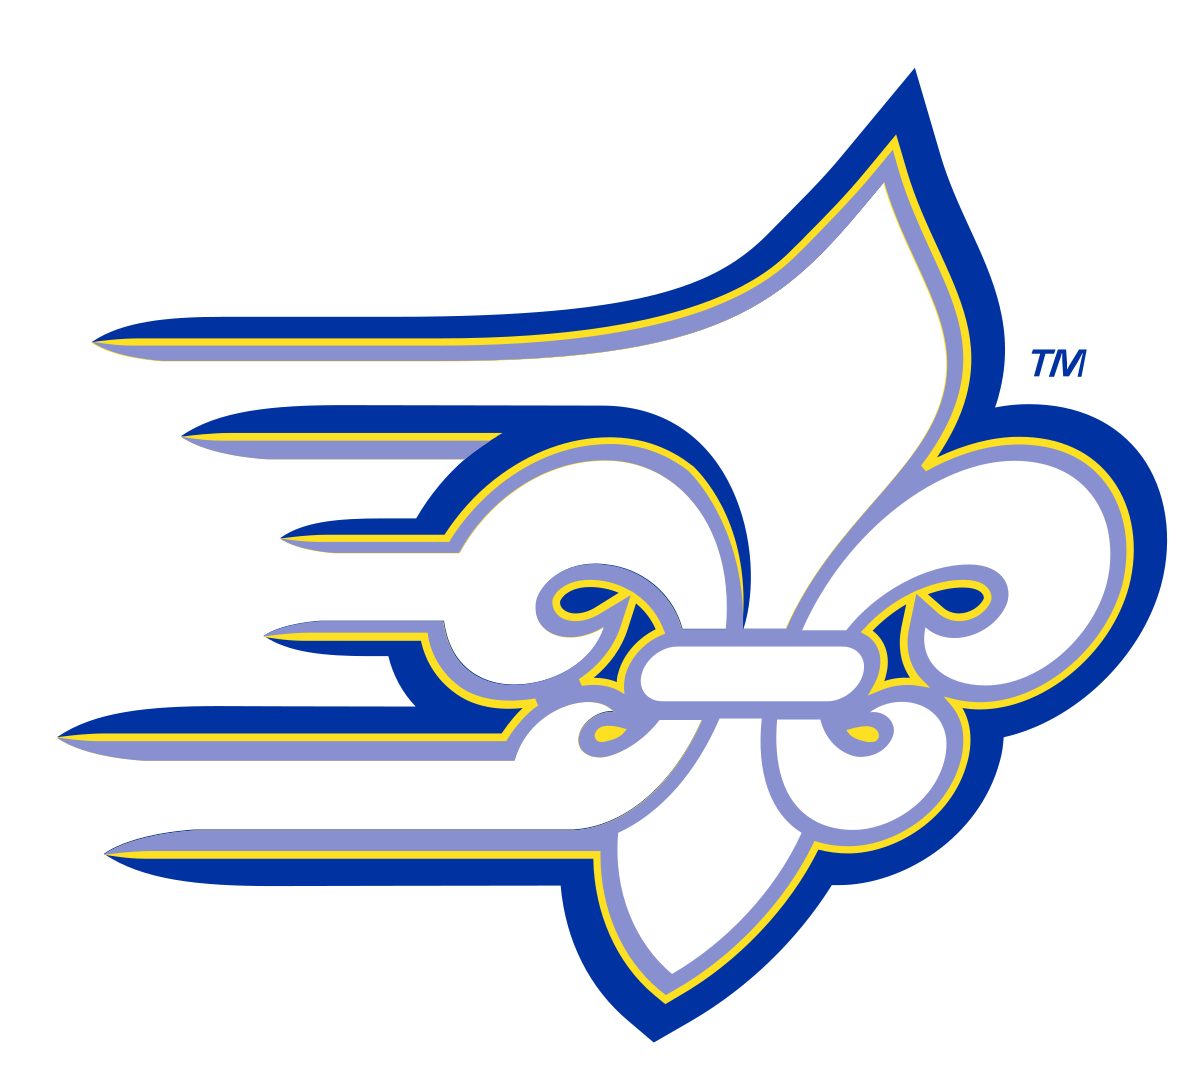 Saints football logo clipart clip art free download Limestone Saints - Wikipedia clip art free download